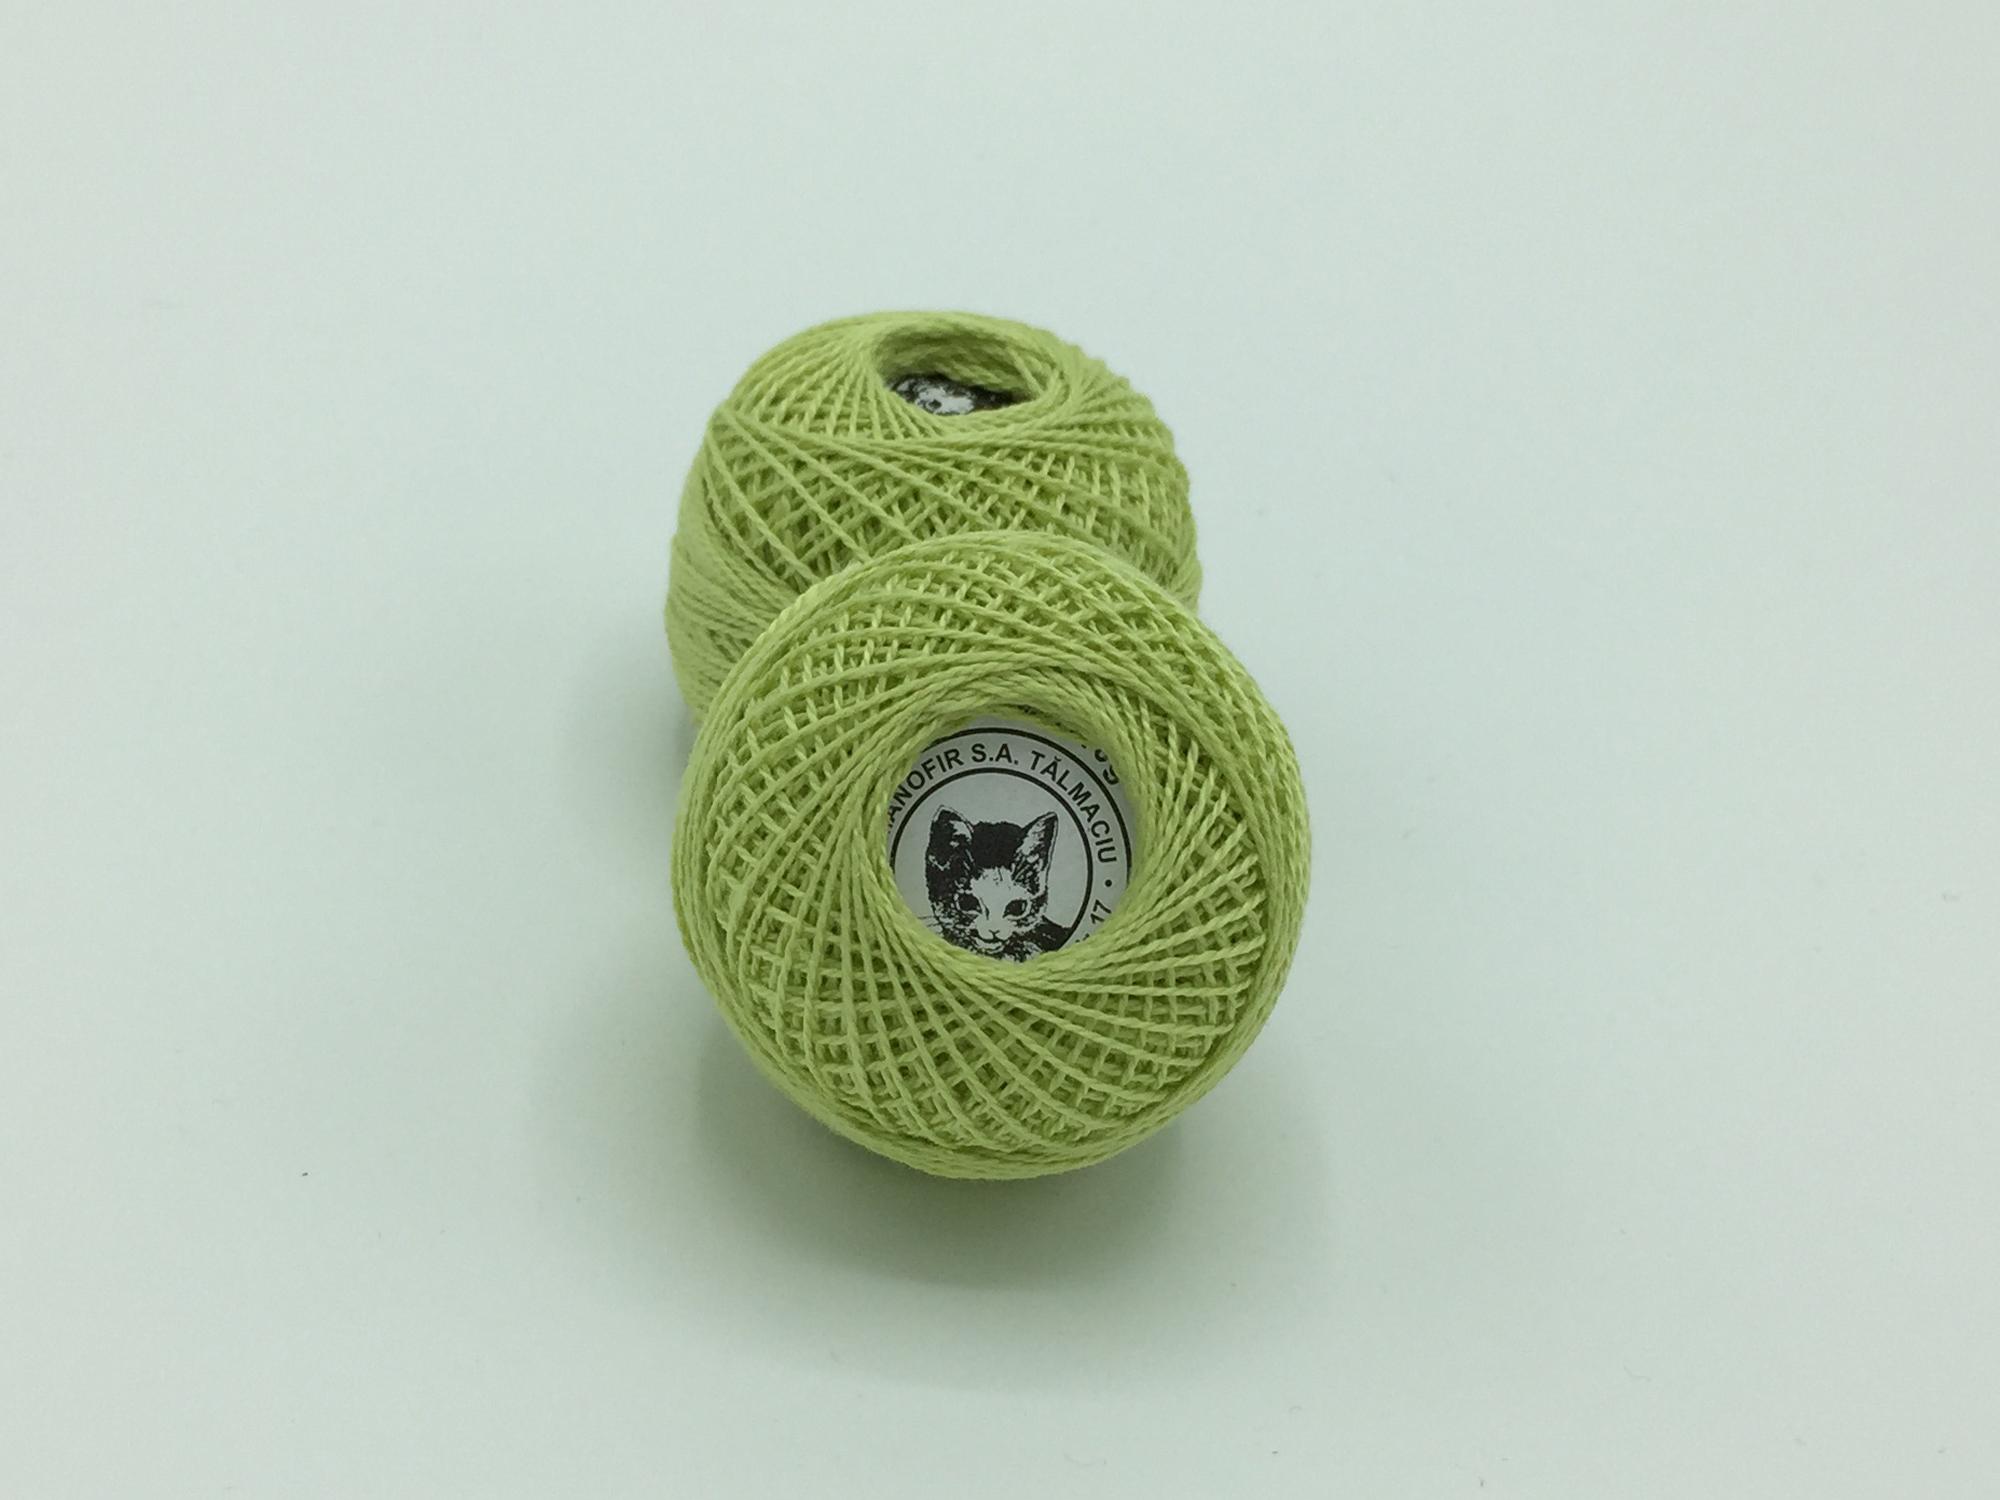 Ata cotton-perle 100% bumbac - Vernil - 10 gheme - Romanofir 20/2